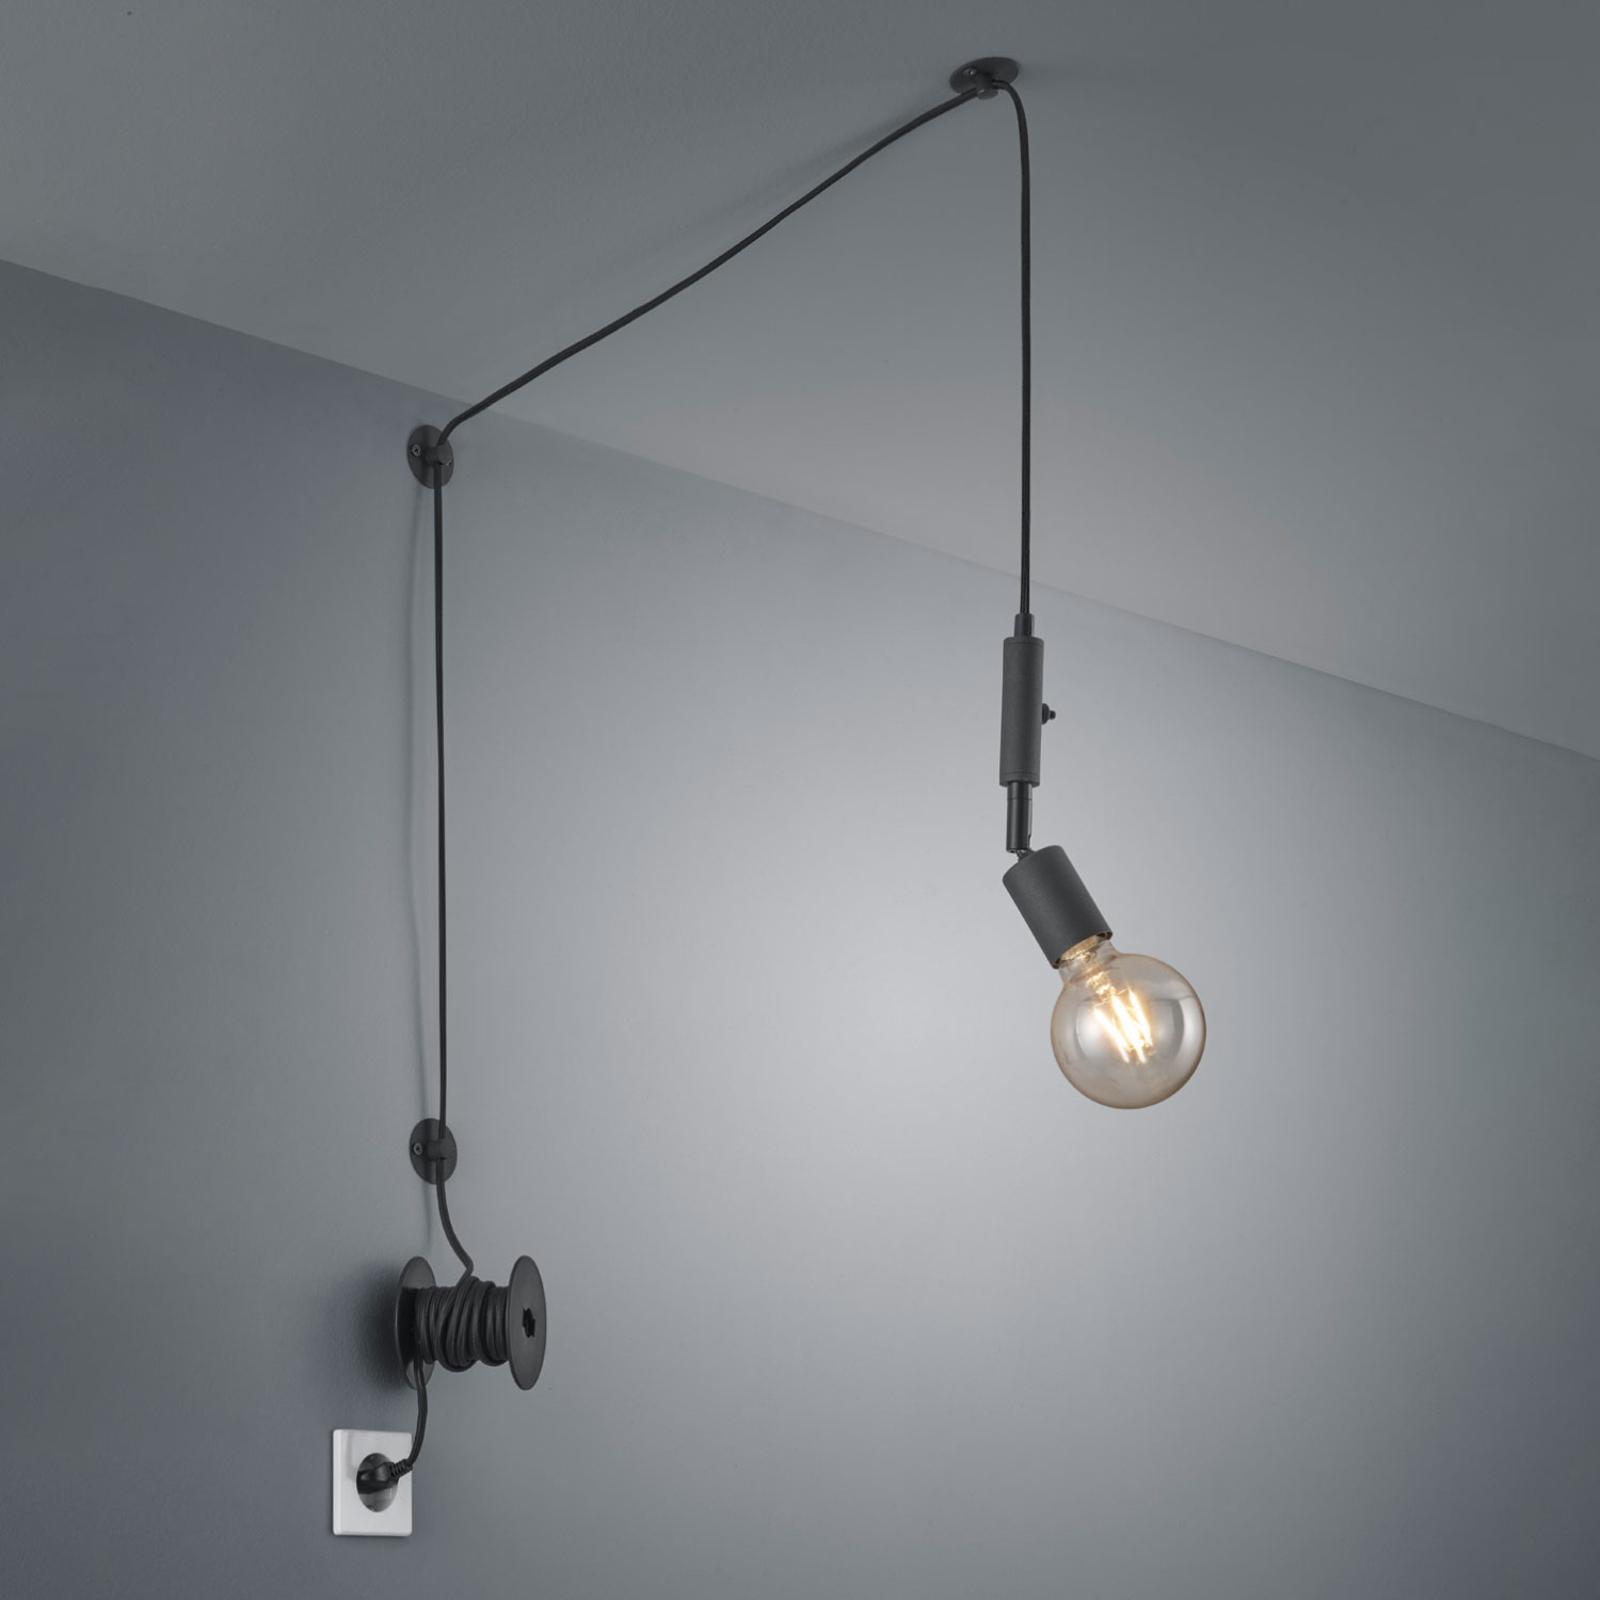 Hanglamp Stella decentraal met stekker zwart